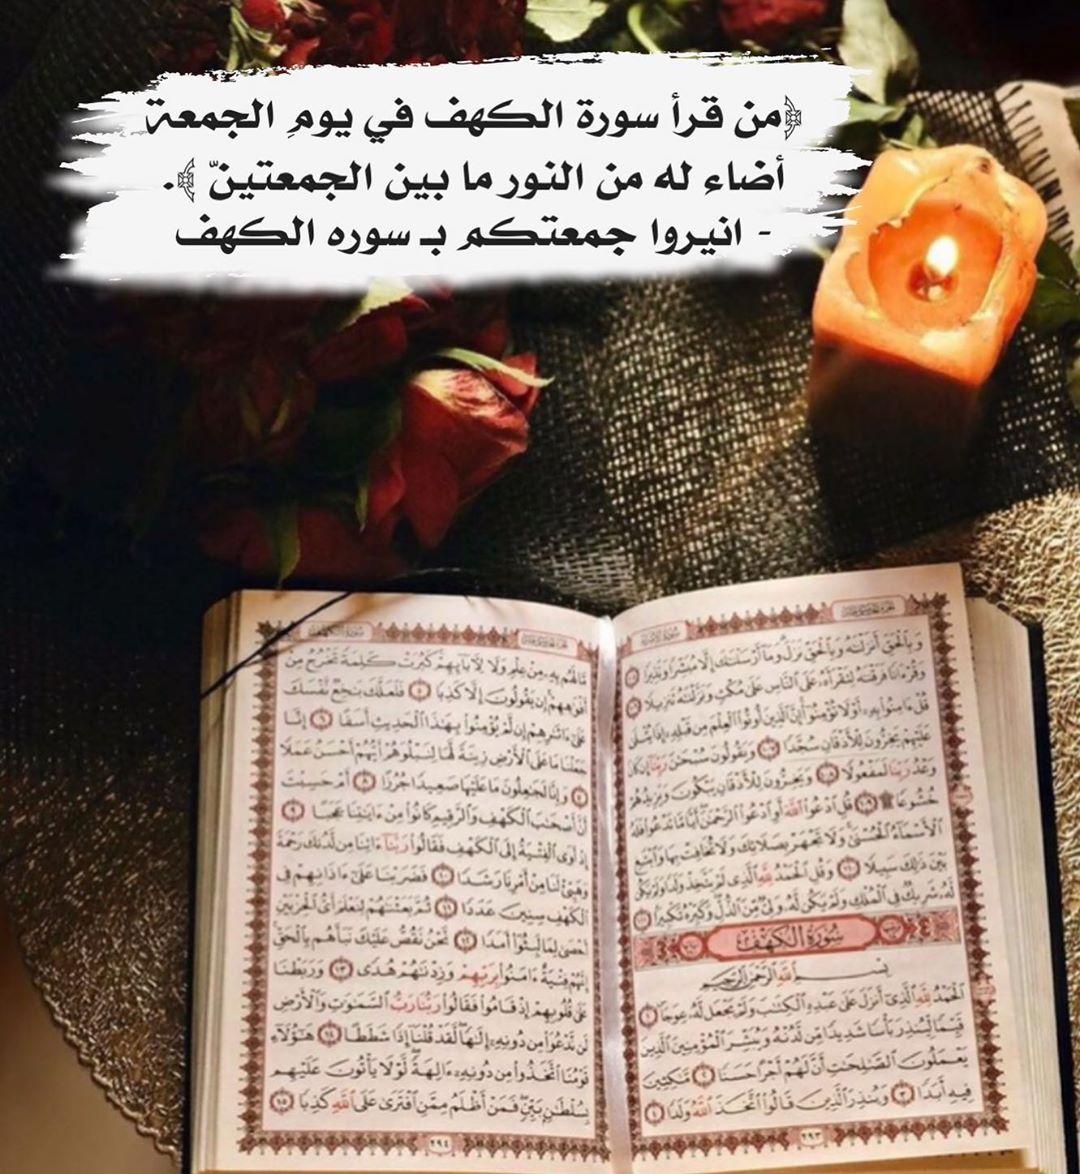 Palamrm5433 Sur Instagram أذكار إسلامية ديني دين اسلام اسلامي هاشتاق اذكار صور رمزيات خلفيات تذكير دنيا الاخرة استغفر ت In 2020 Book Cover Art